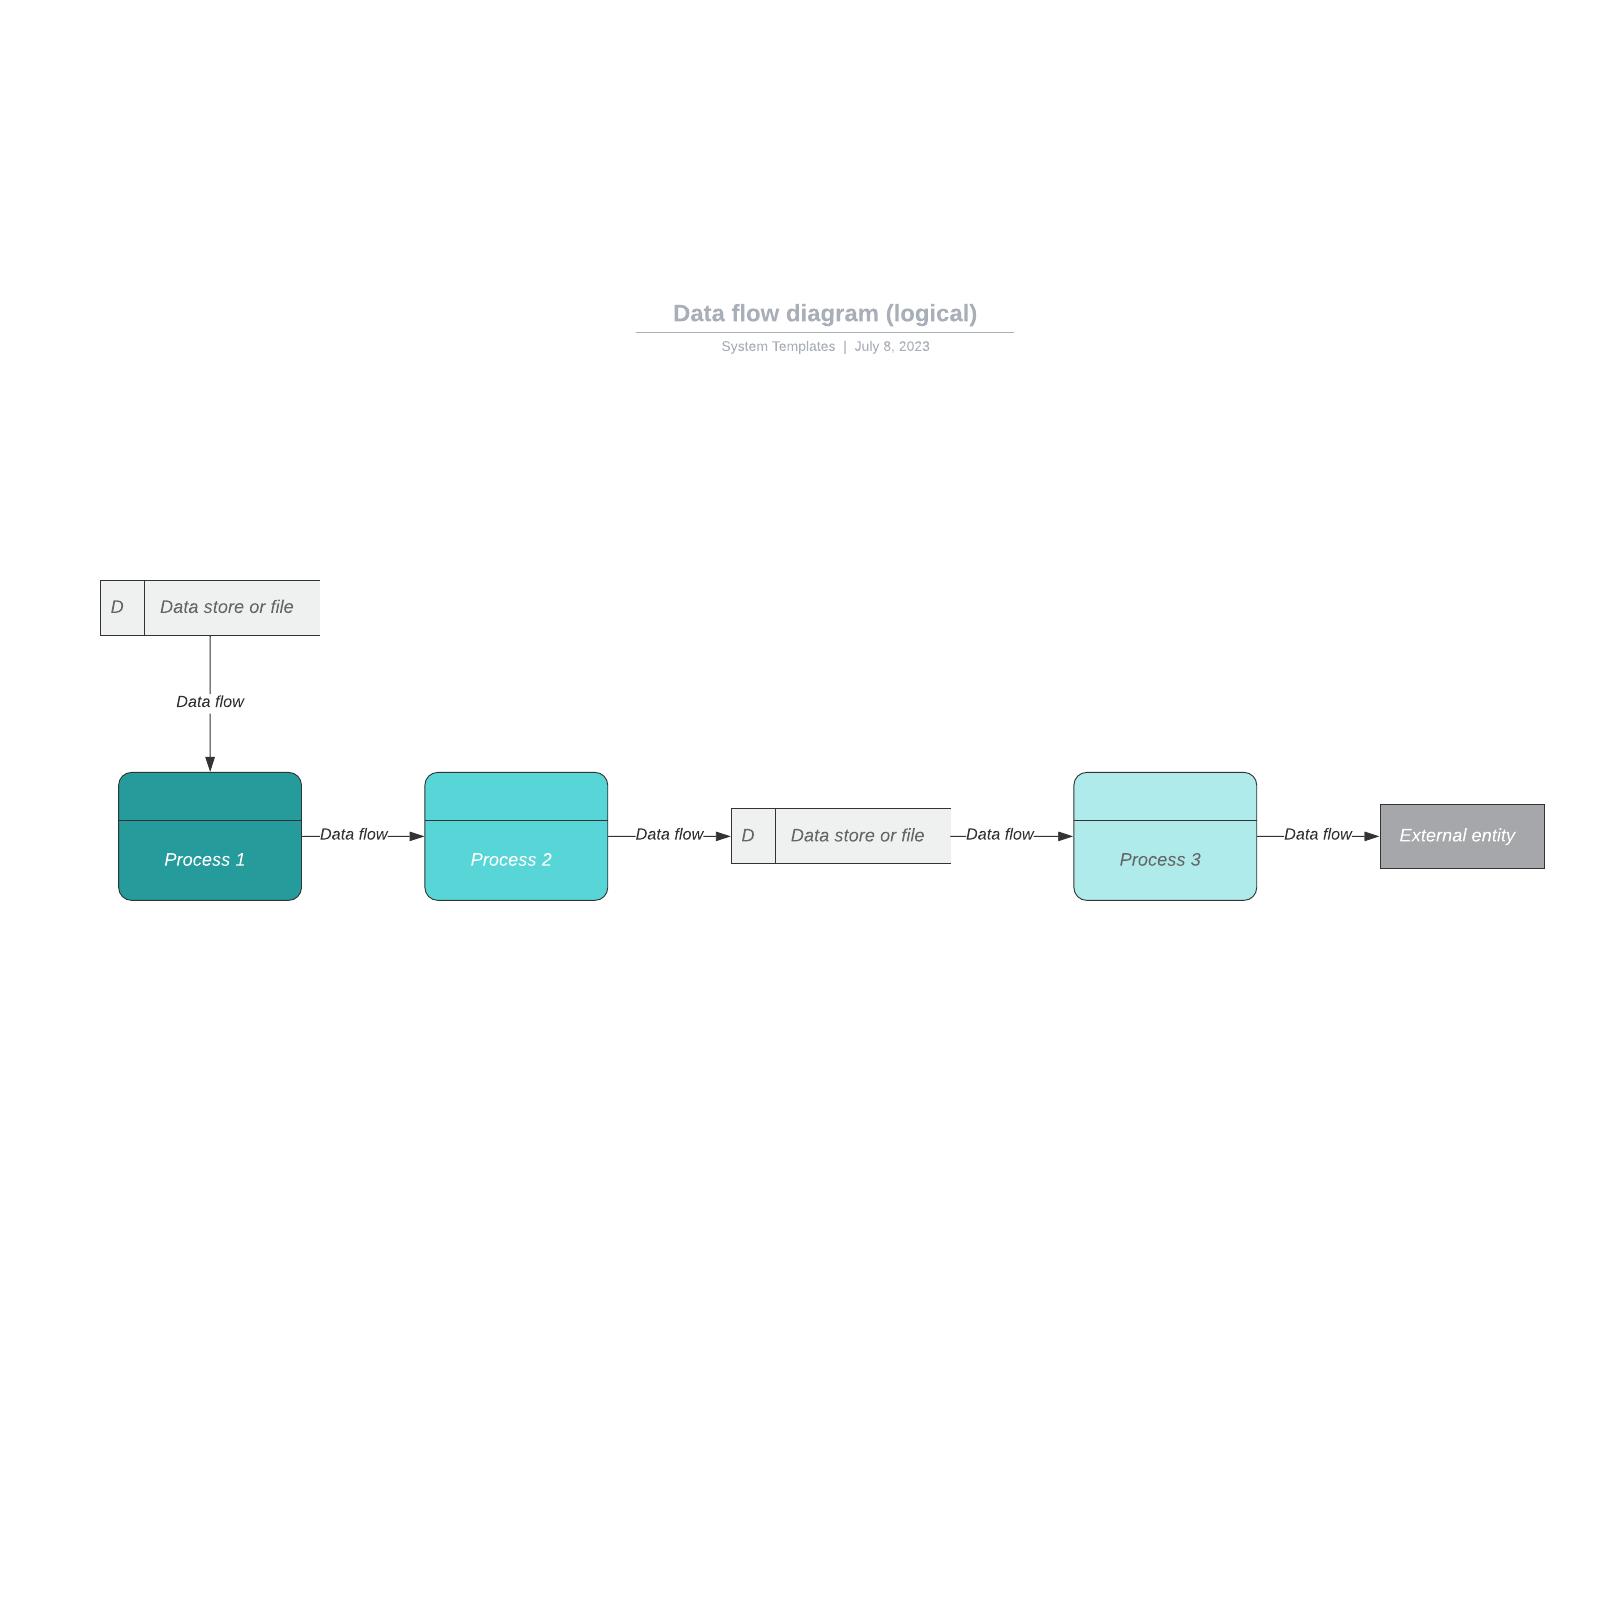 Data flow diagram (logical)